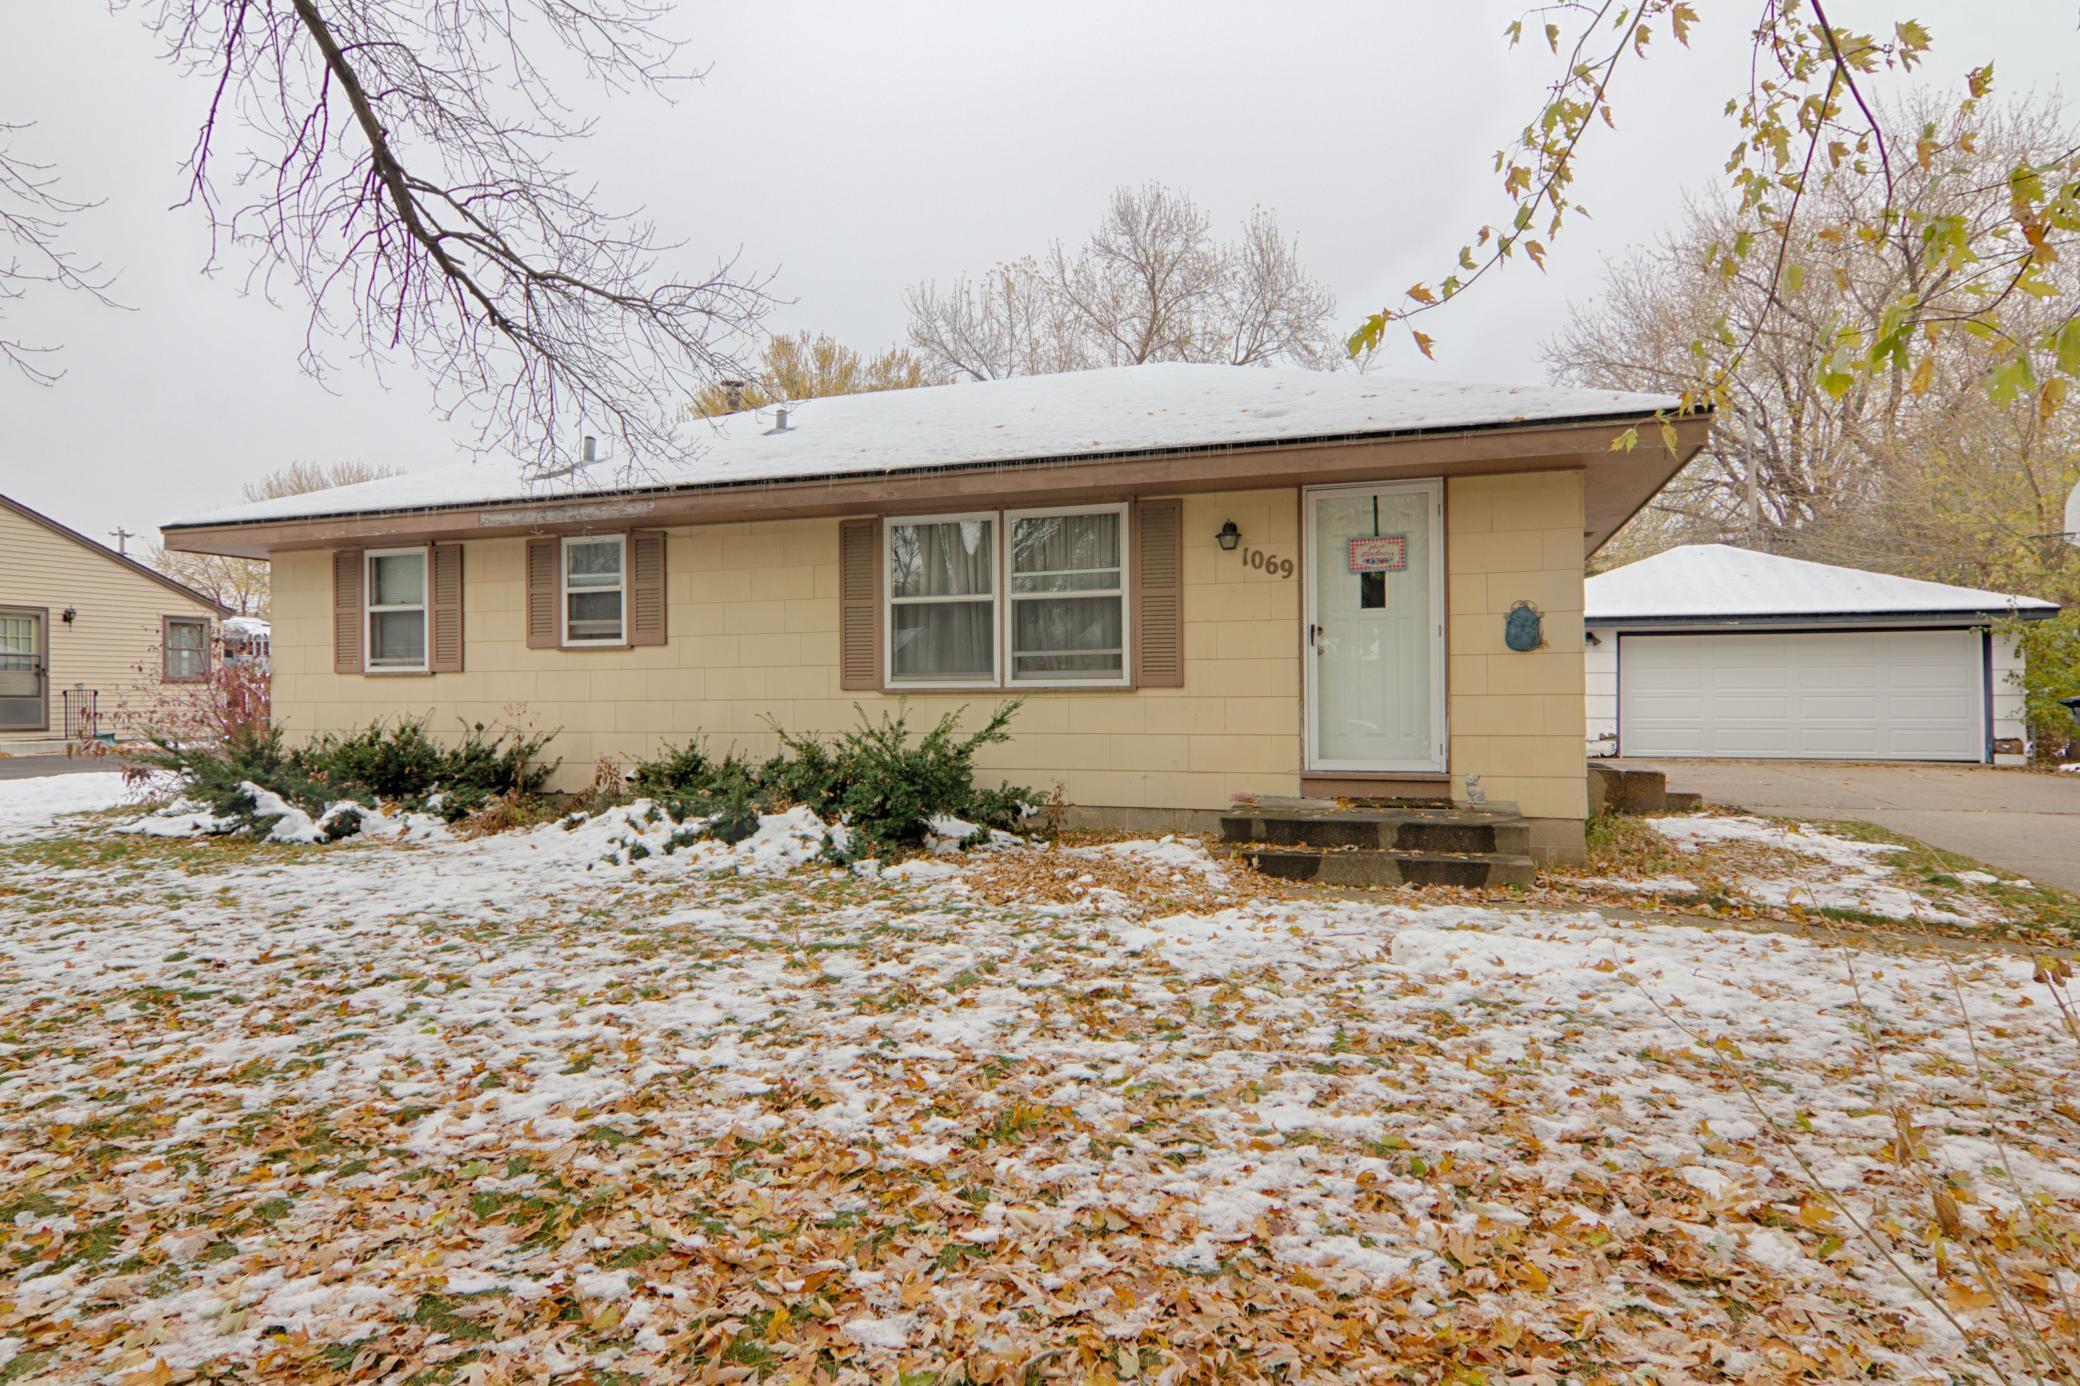 1069 Keefe Street Property Photo - Eagan, MN real estate listing